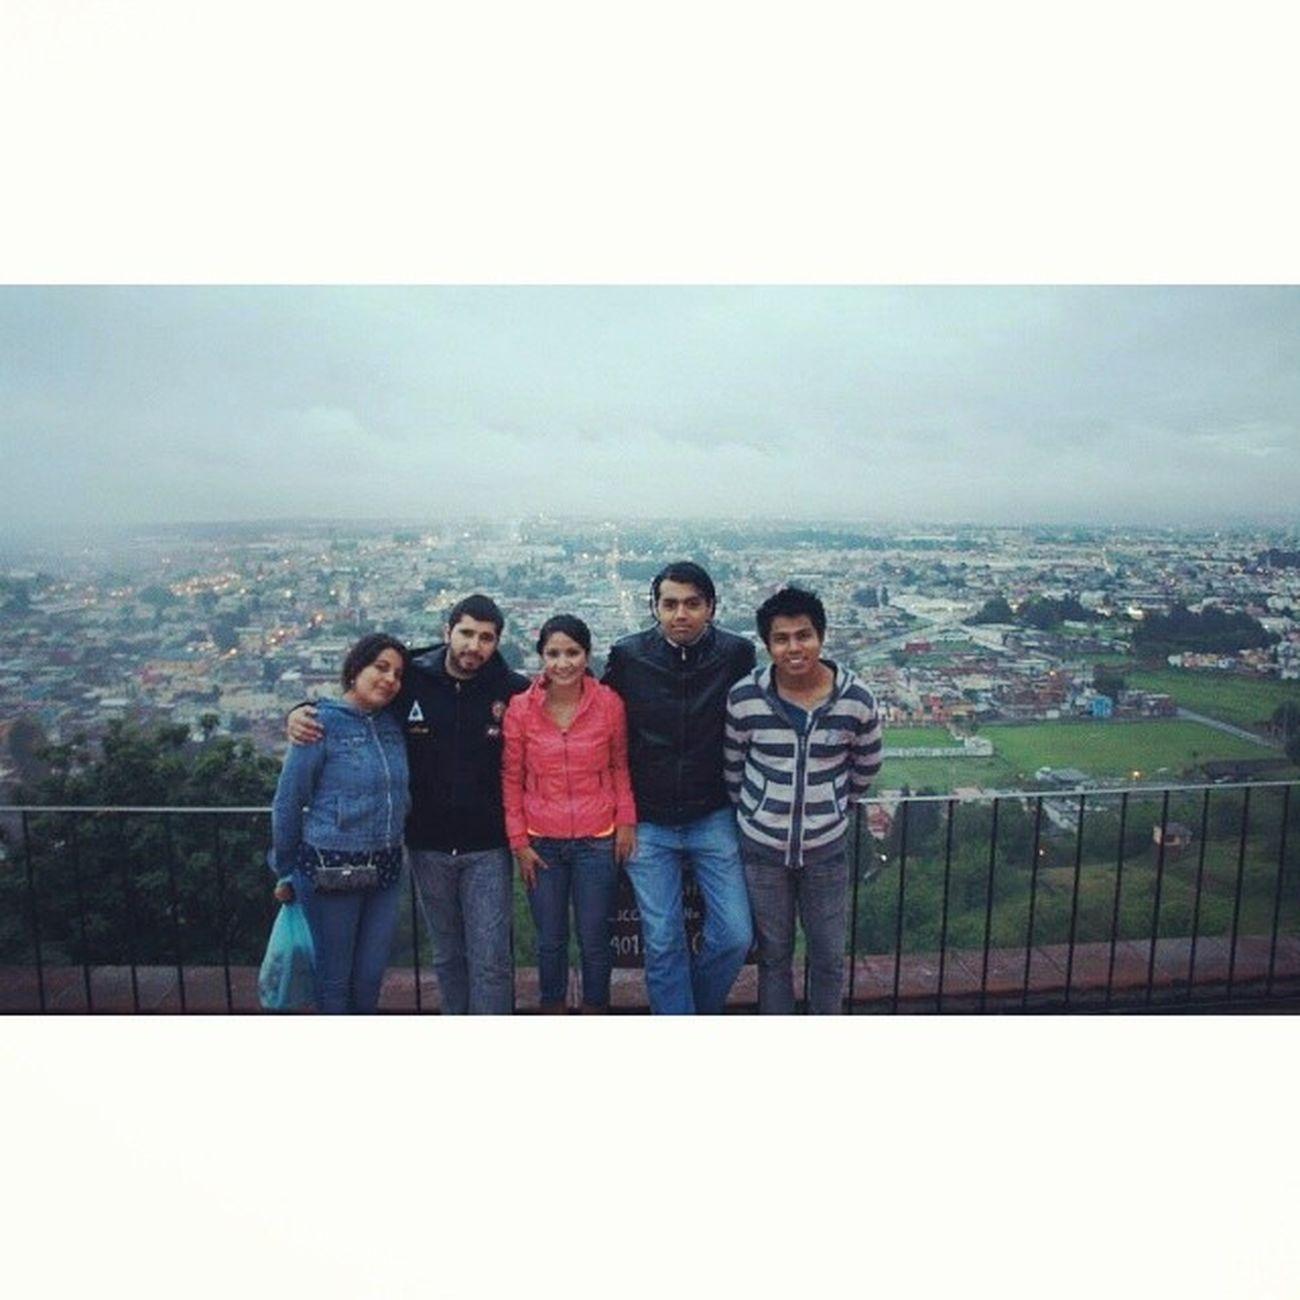 Paseando. Cholula Puebla Inaoe